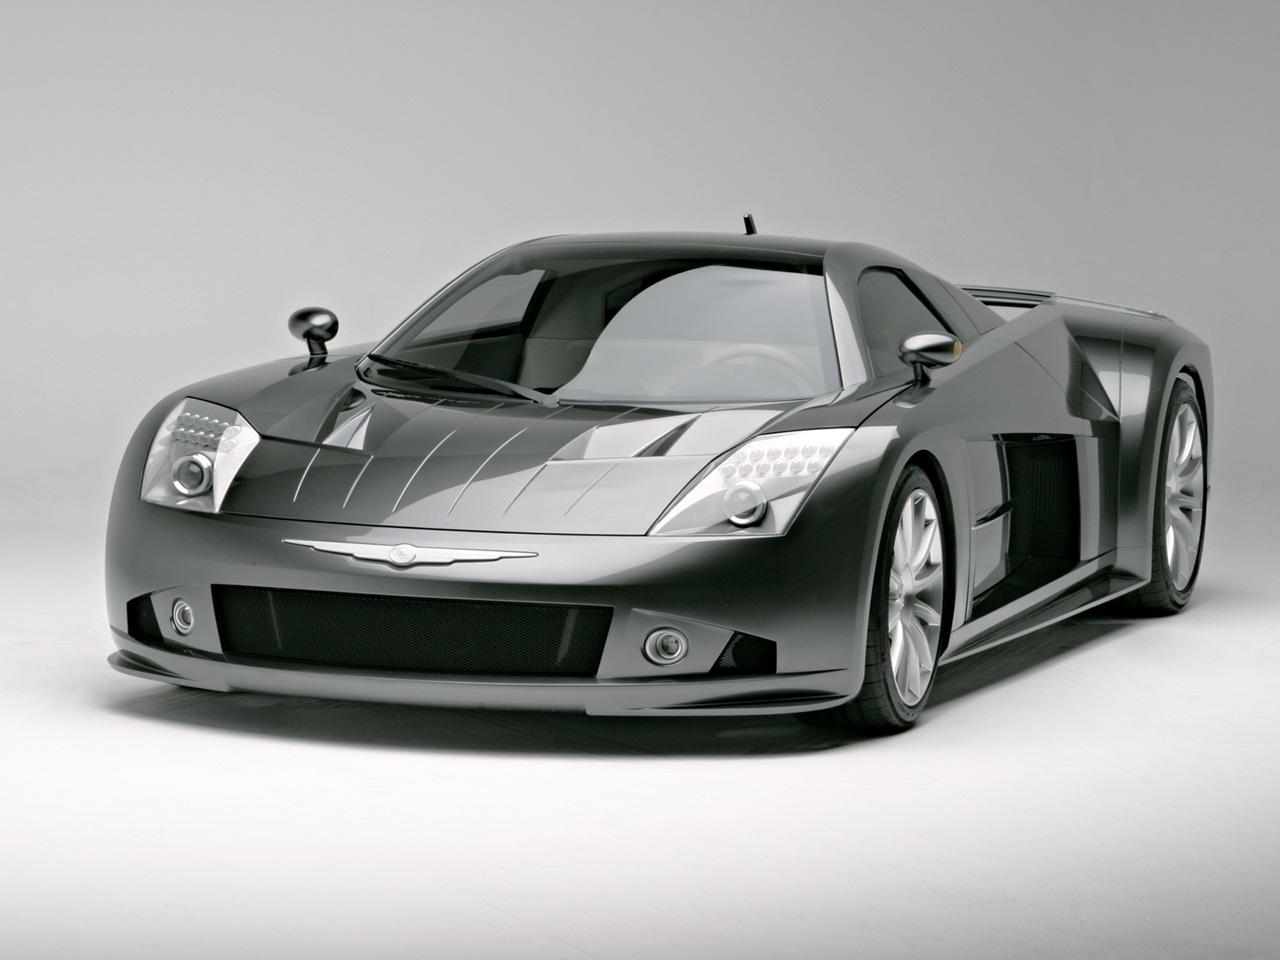 Crysler Cars: Fast Concept Supercars: Chrysler ME Four-Twelve